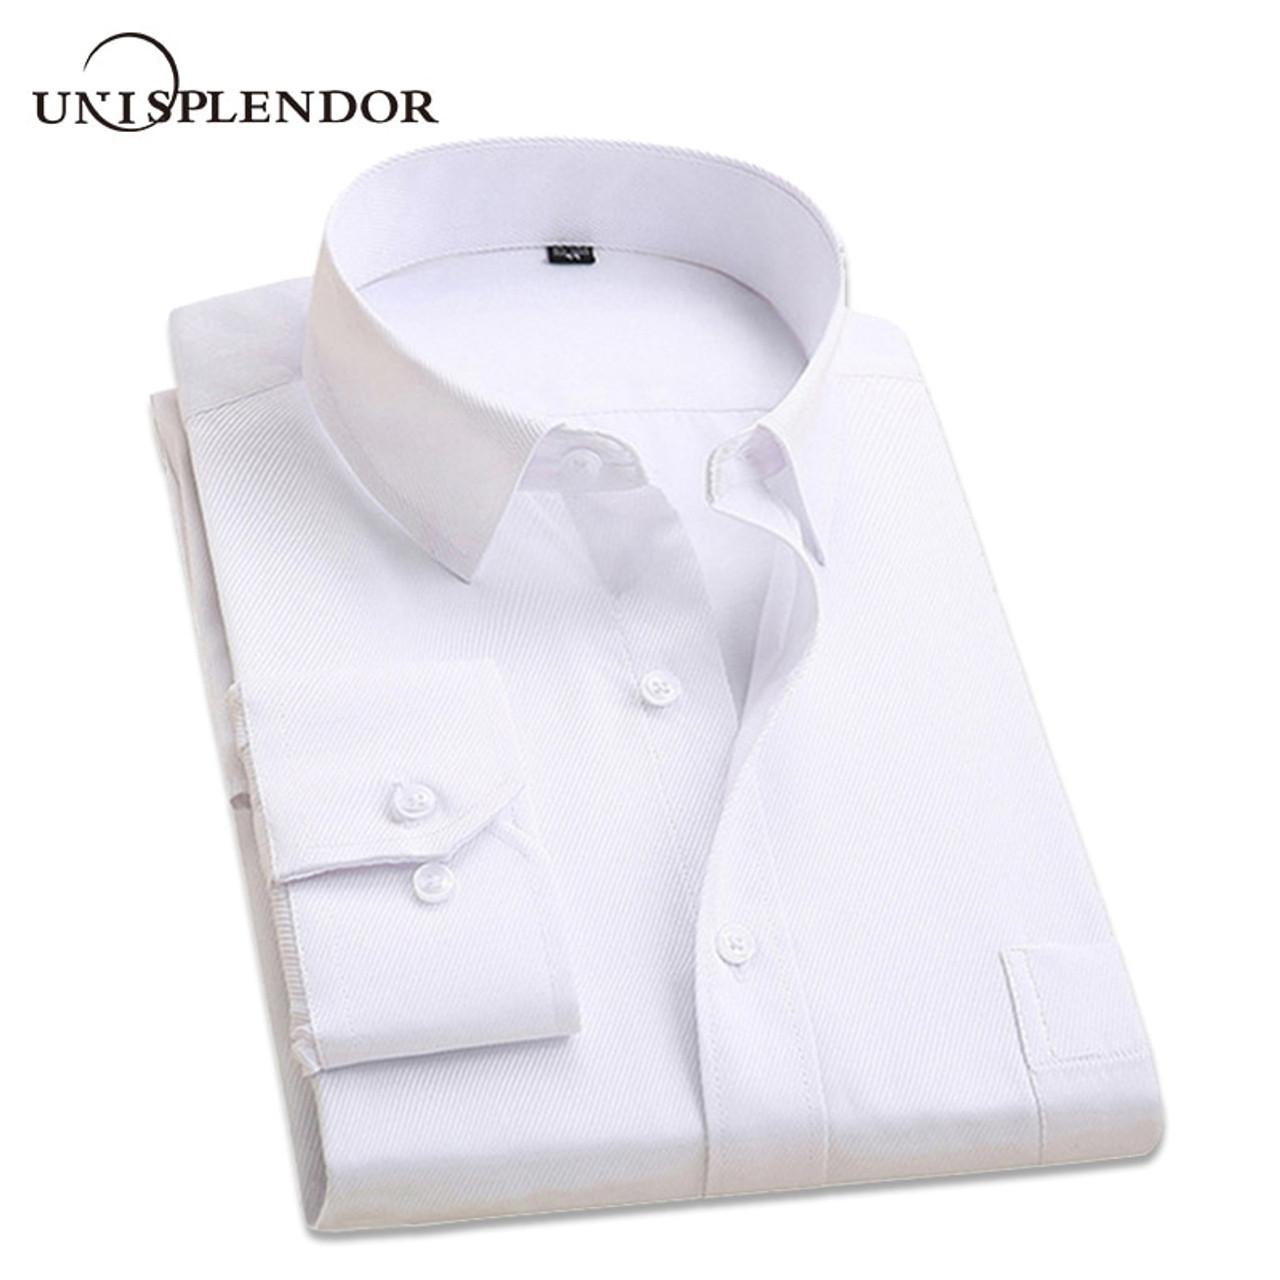 2069d3f6c47 2018 Classic Solid Color Men s Shirt Long Sleeve Formal Business Shirts Men  Slim Fit Wedding Shirt ...